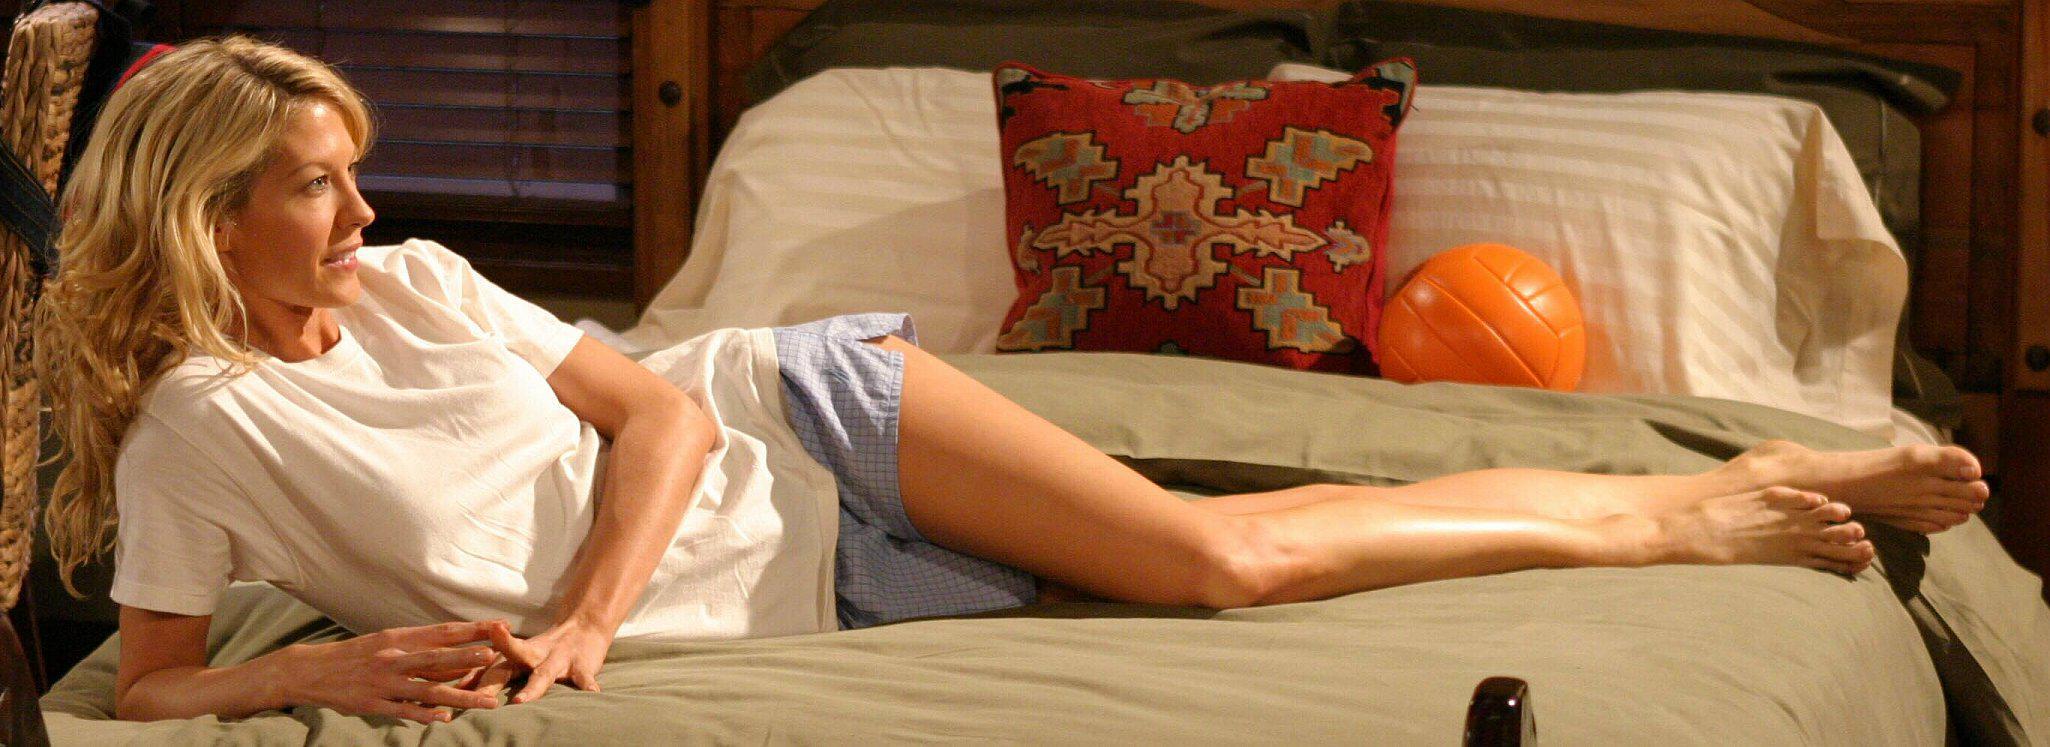 Jenna Elfman 2050x Kb